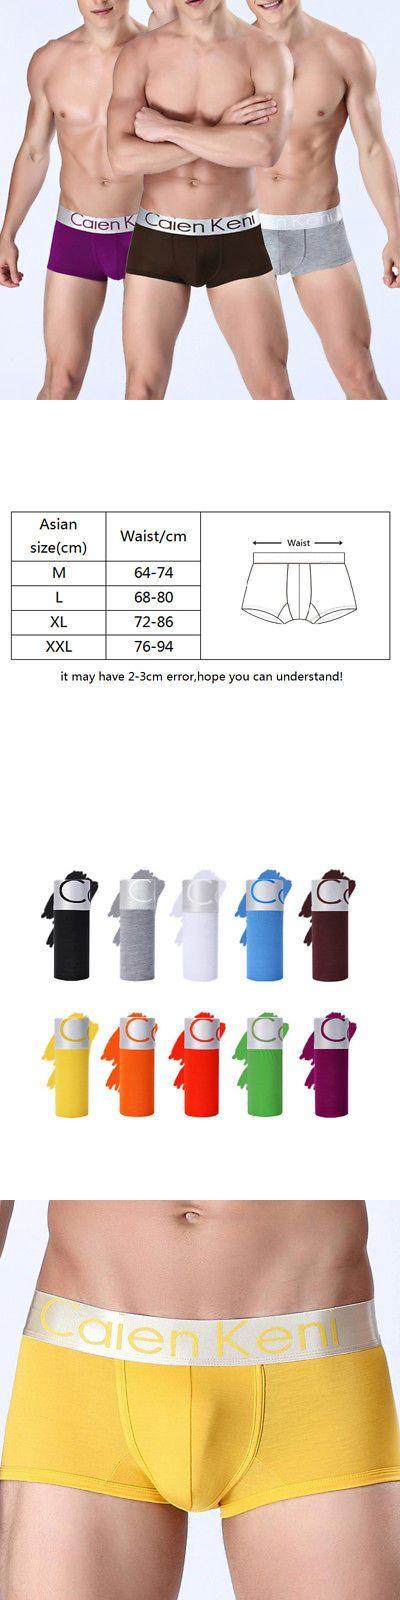 Man Boxers: Men Cotton Breathable Underwear Boxer Briefs Shorts Bulge Pouch Underpants -> BUY IT NOW ONLY: $2.59 on eBay!